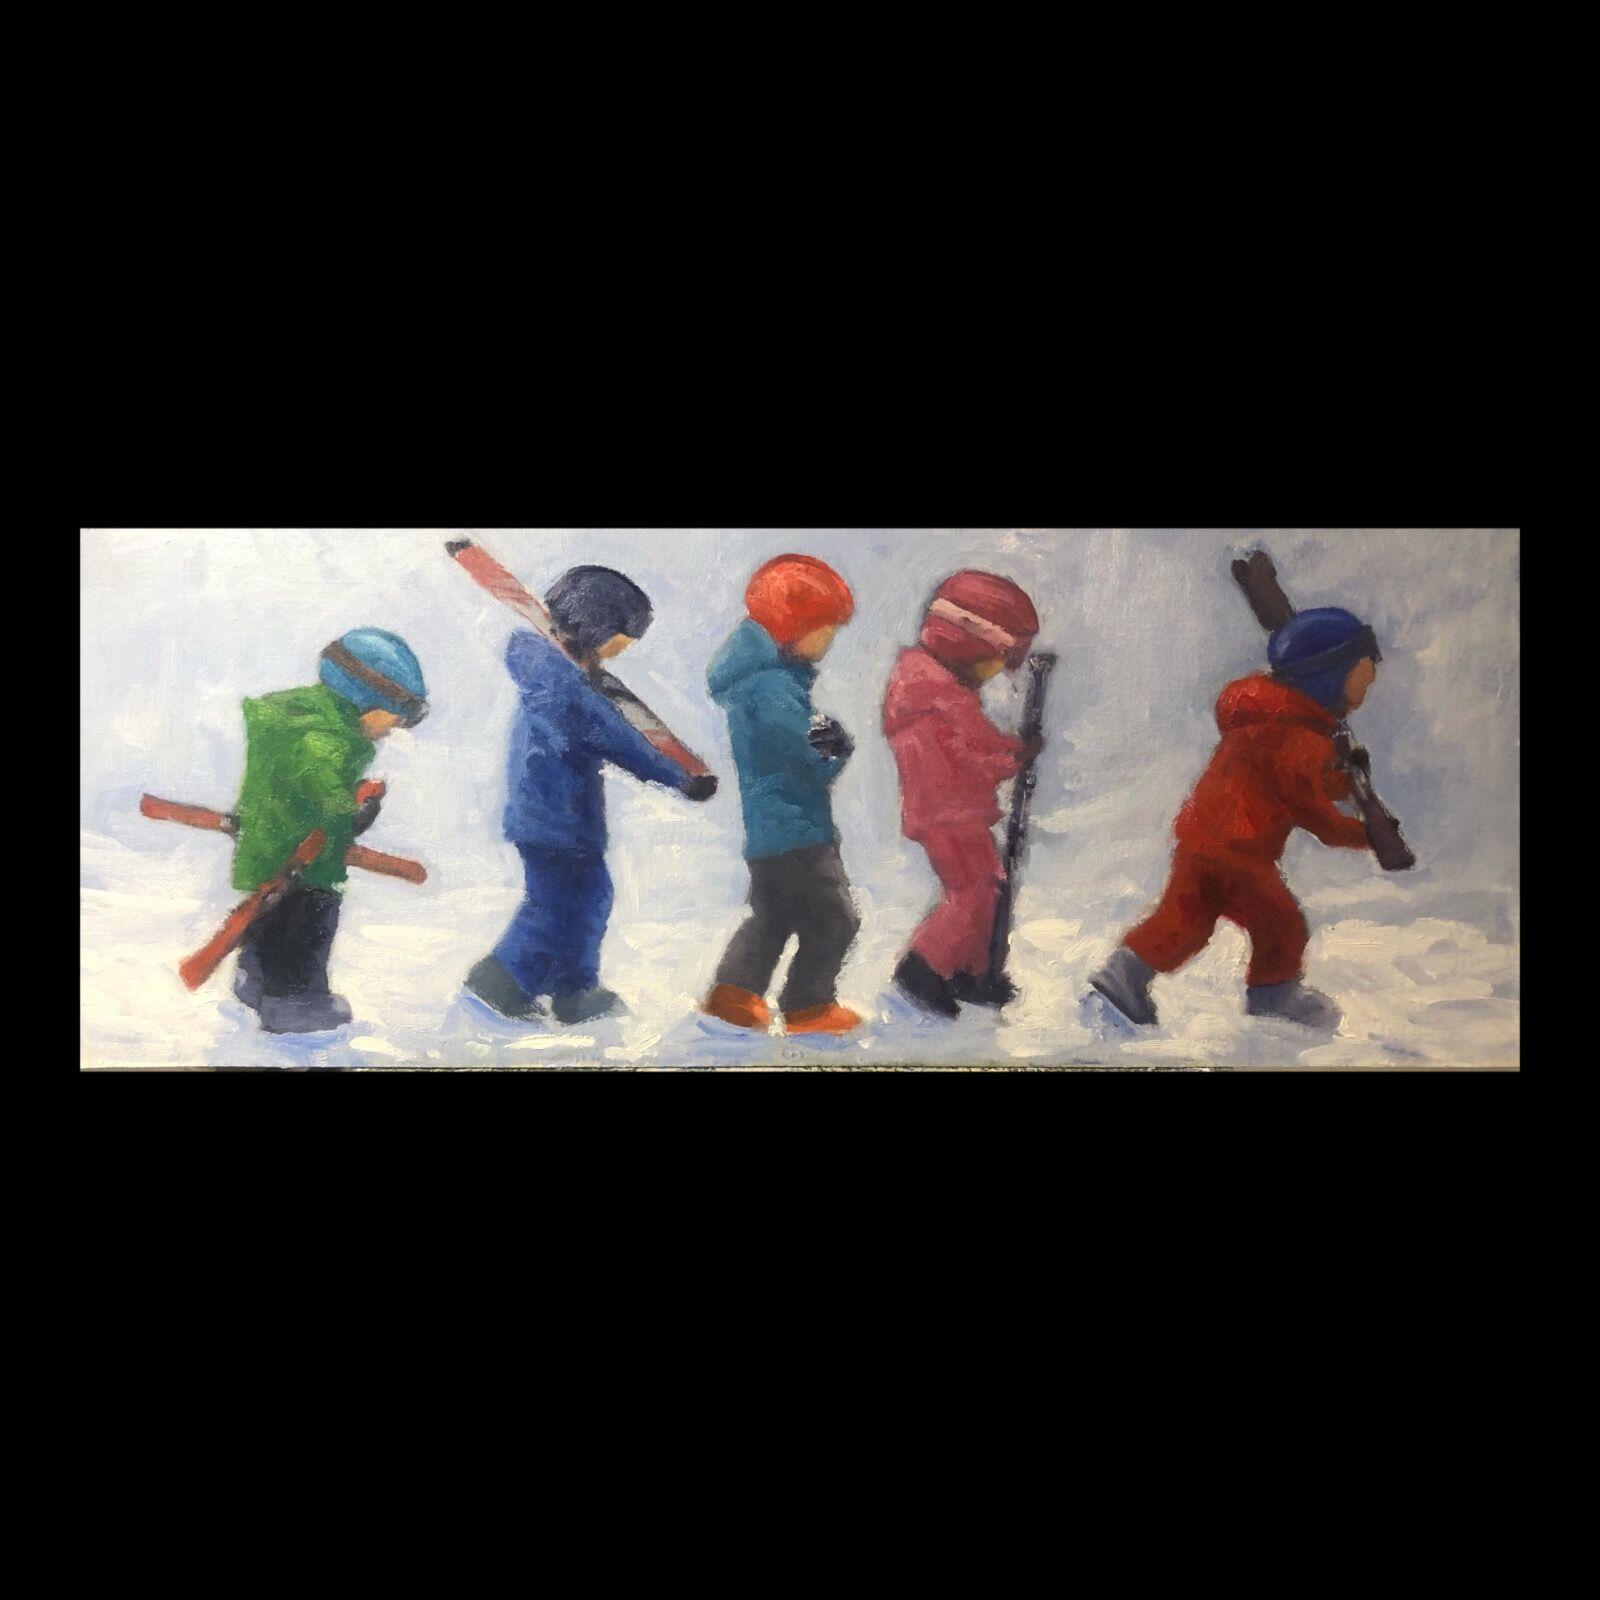 On the way to ski school